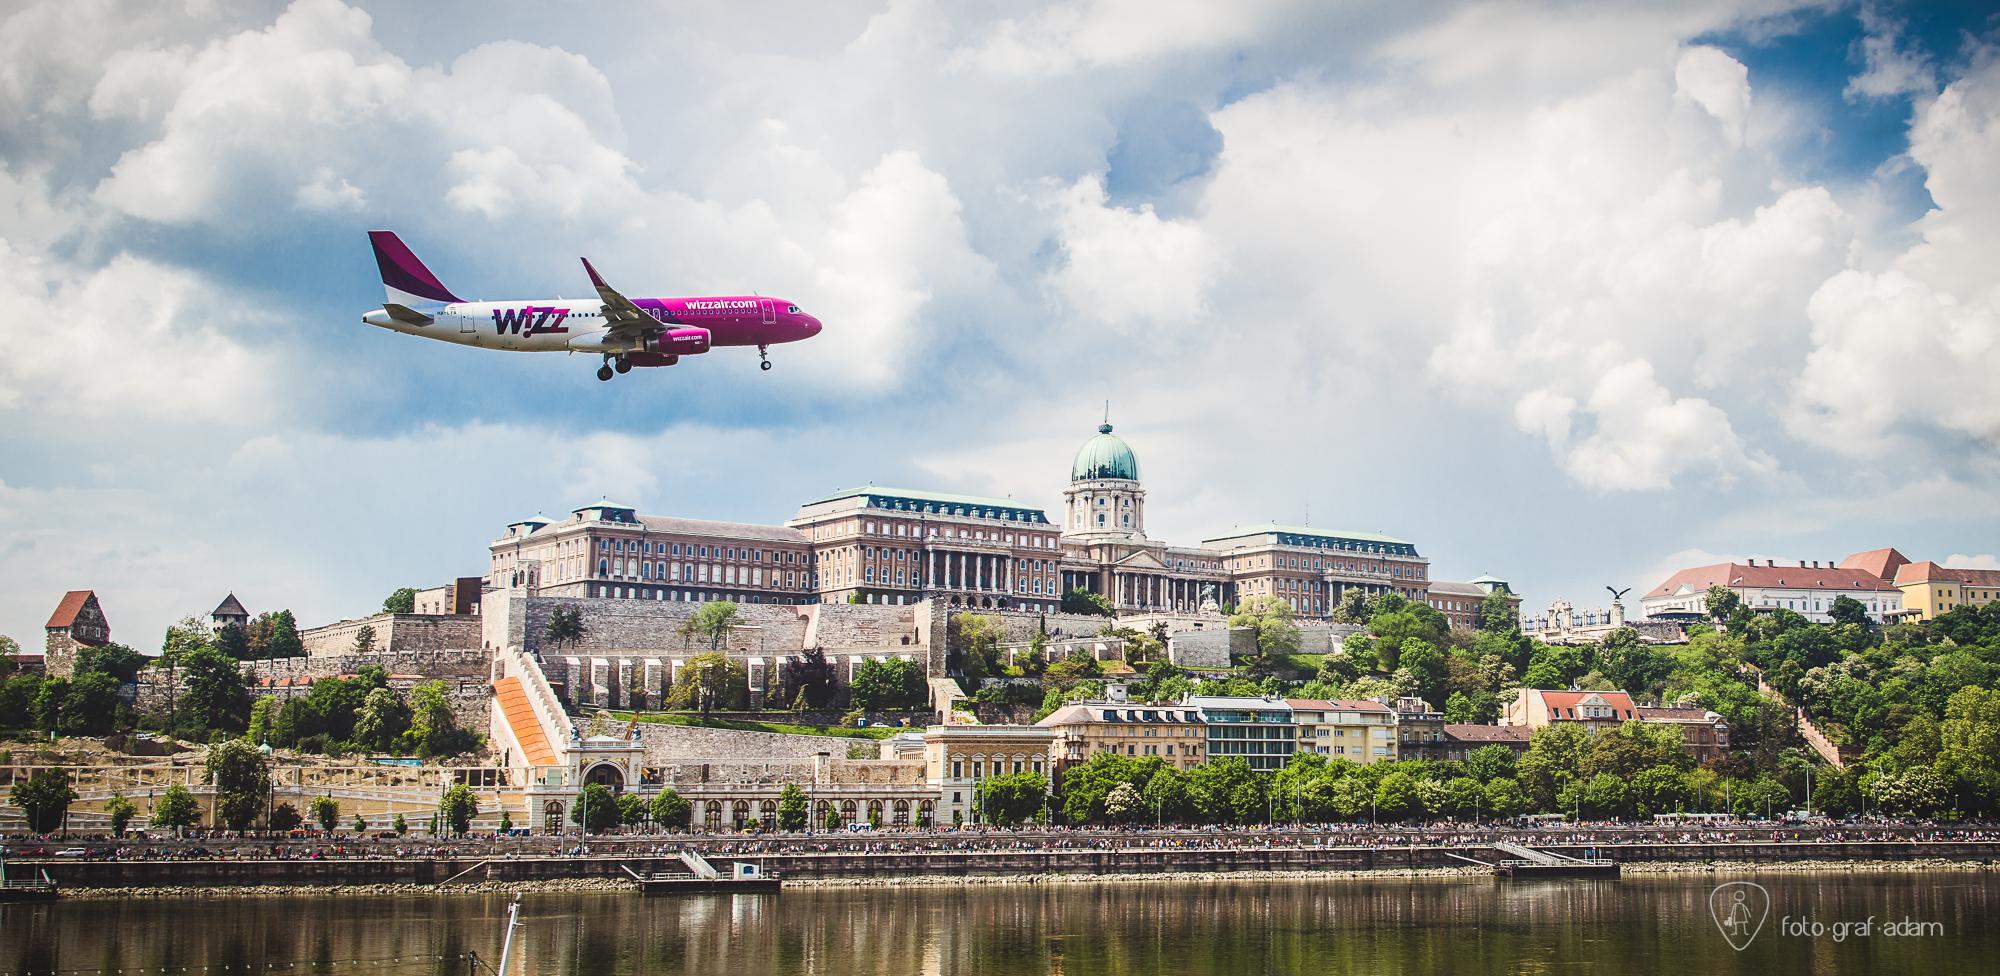 WizzAir airbus a Duna felett - Graf Ádám